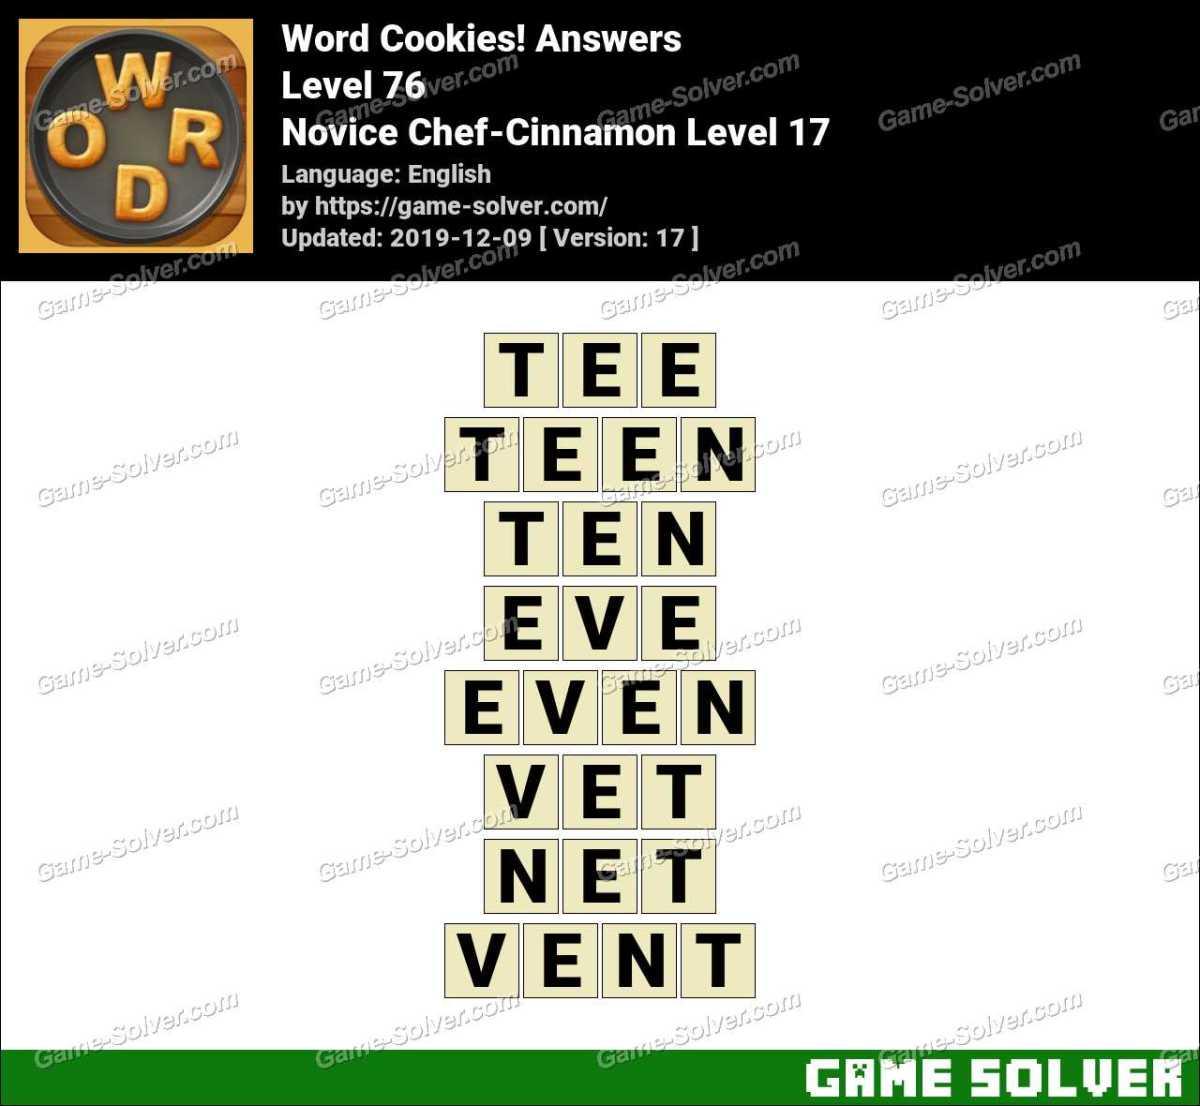 Word Cookies Novice Chef-Cinnamon Level 17 Answers